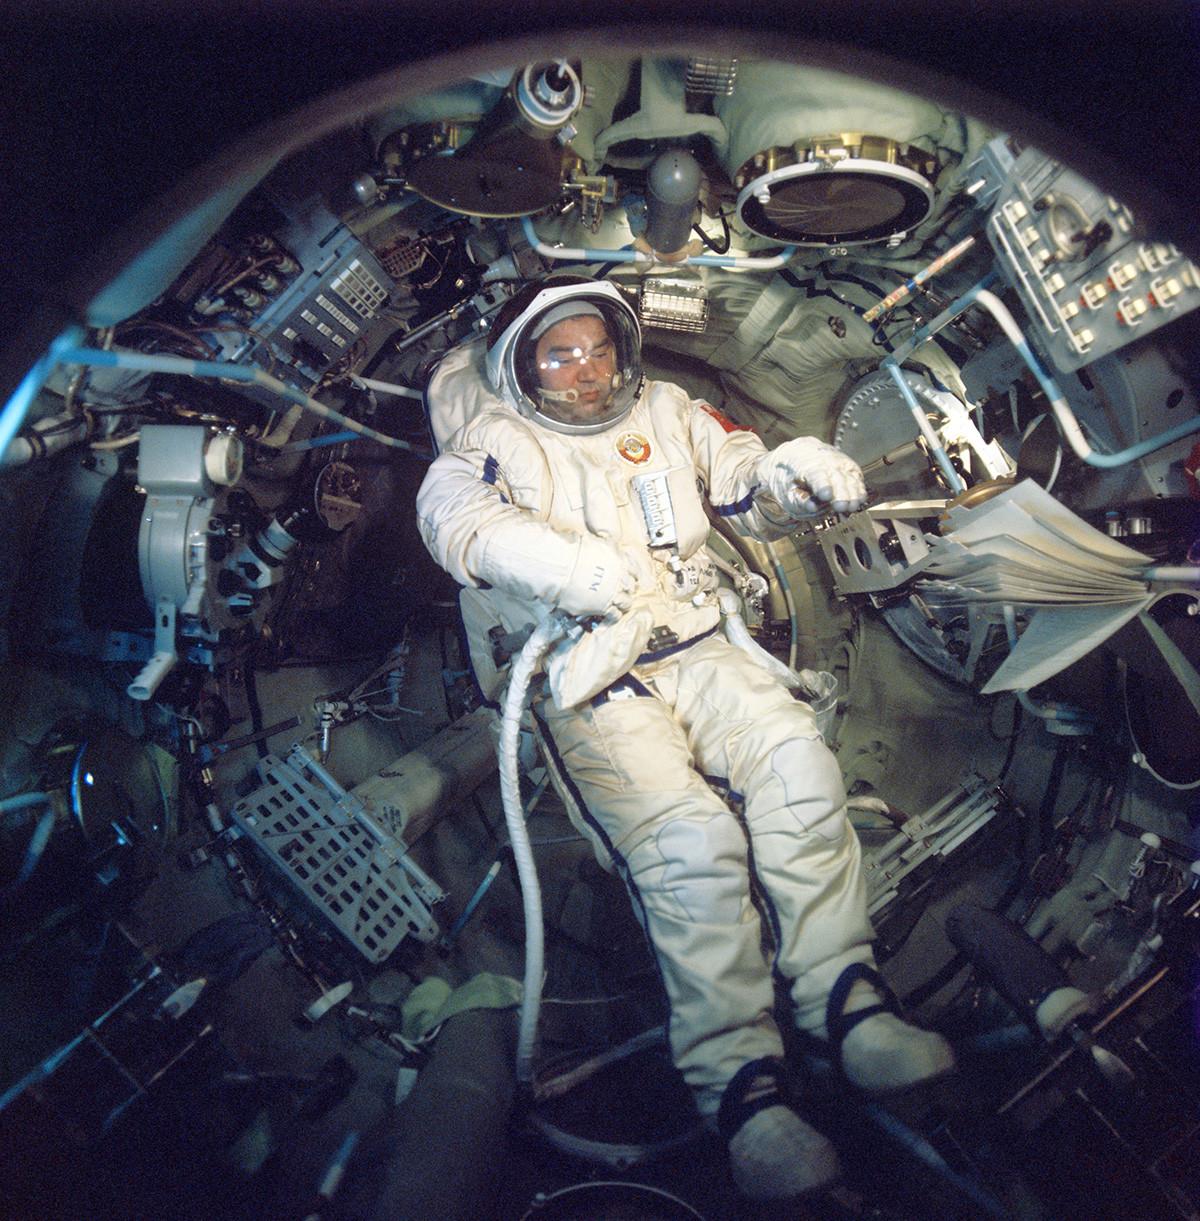 Soviet cosmonaut Georgy Grechko (flight engineer) on board of the space complex 'Soyuz-26'-'Salyut-6'.1978.